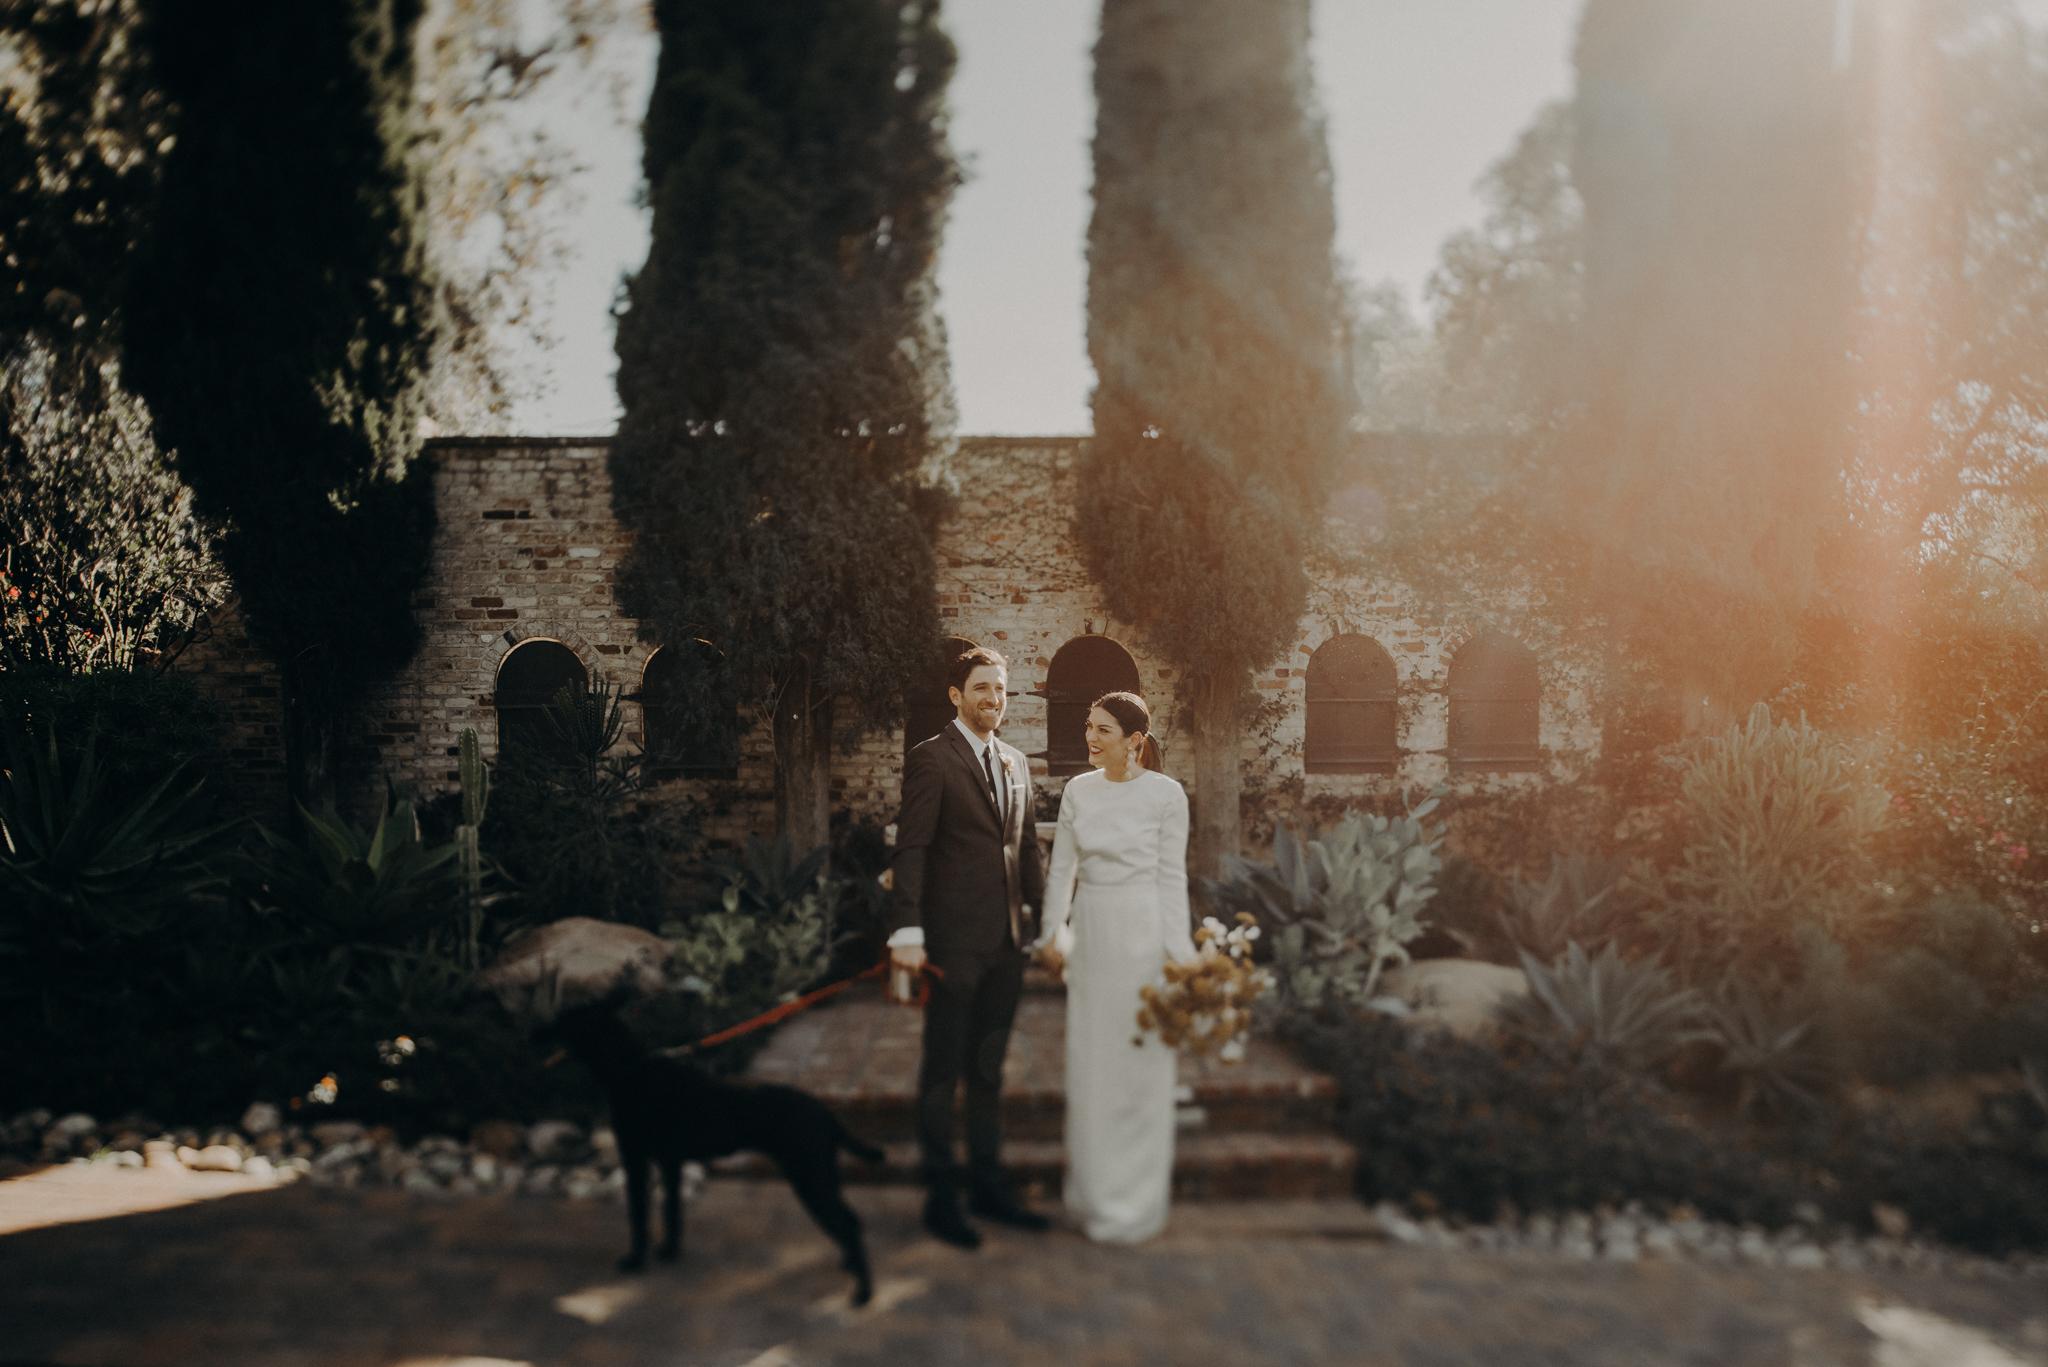 Hummingbird Nest Ranch Wedding - Wedding Photographer in Los Angeles - IsaiahAndTaylor.com-026.jpg